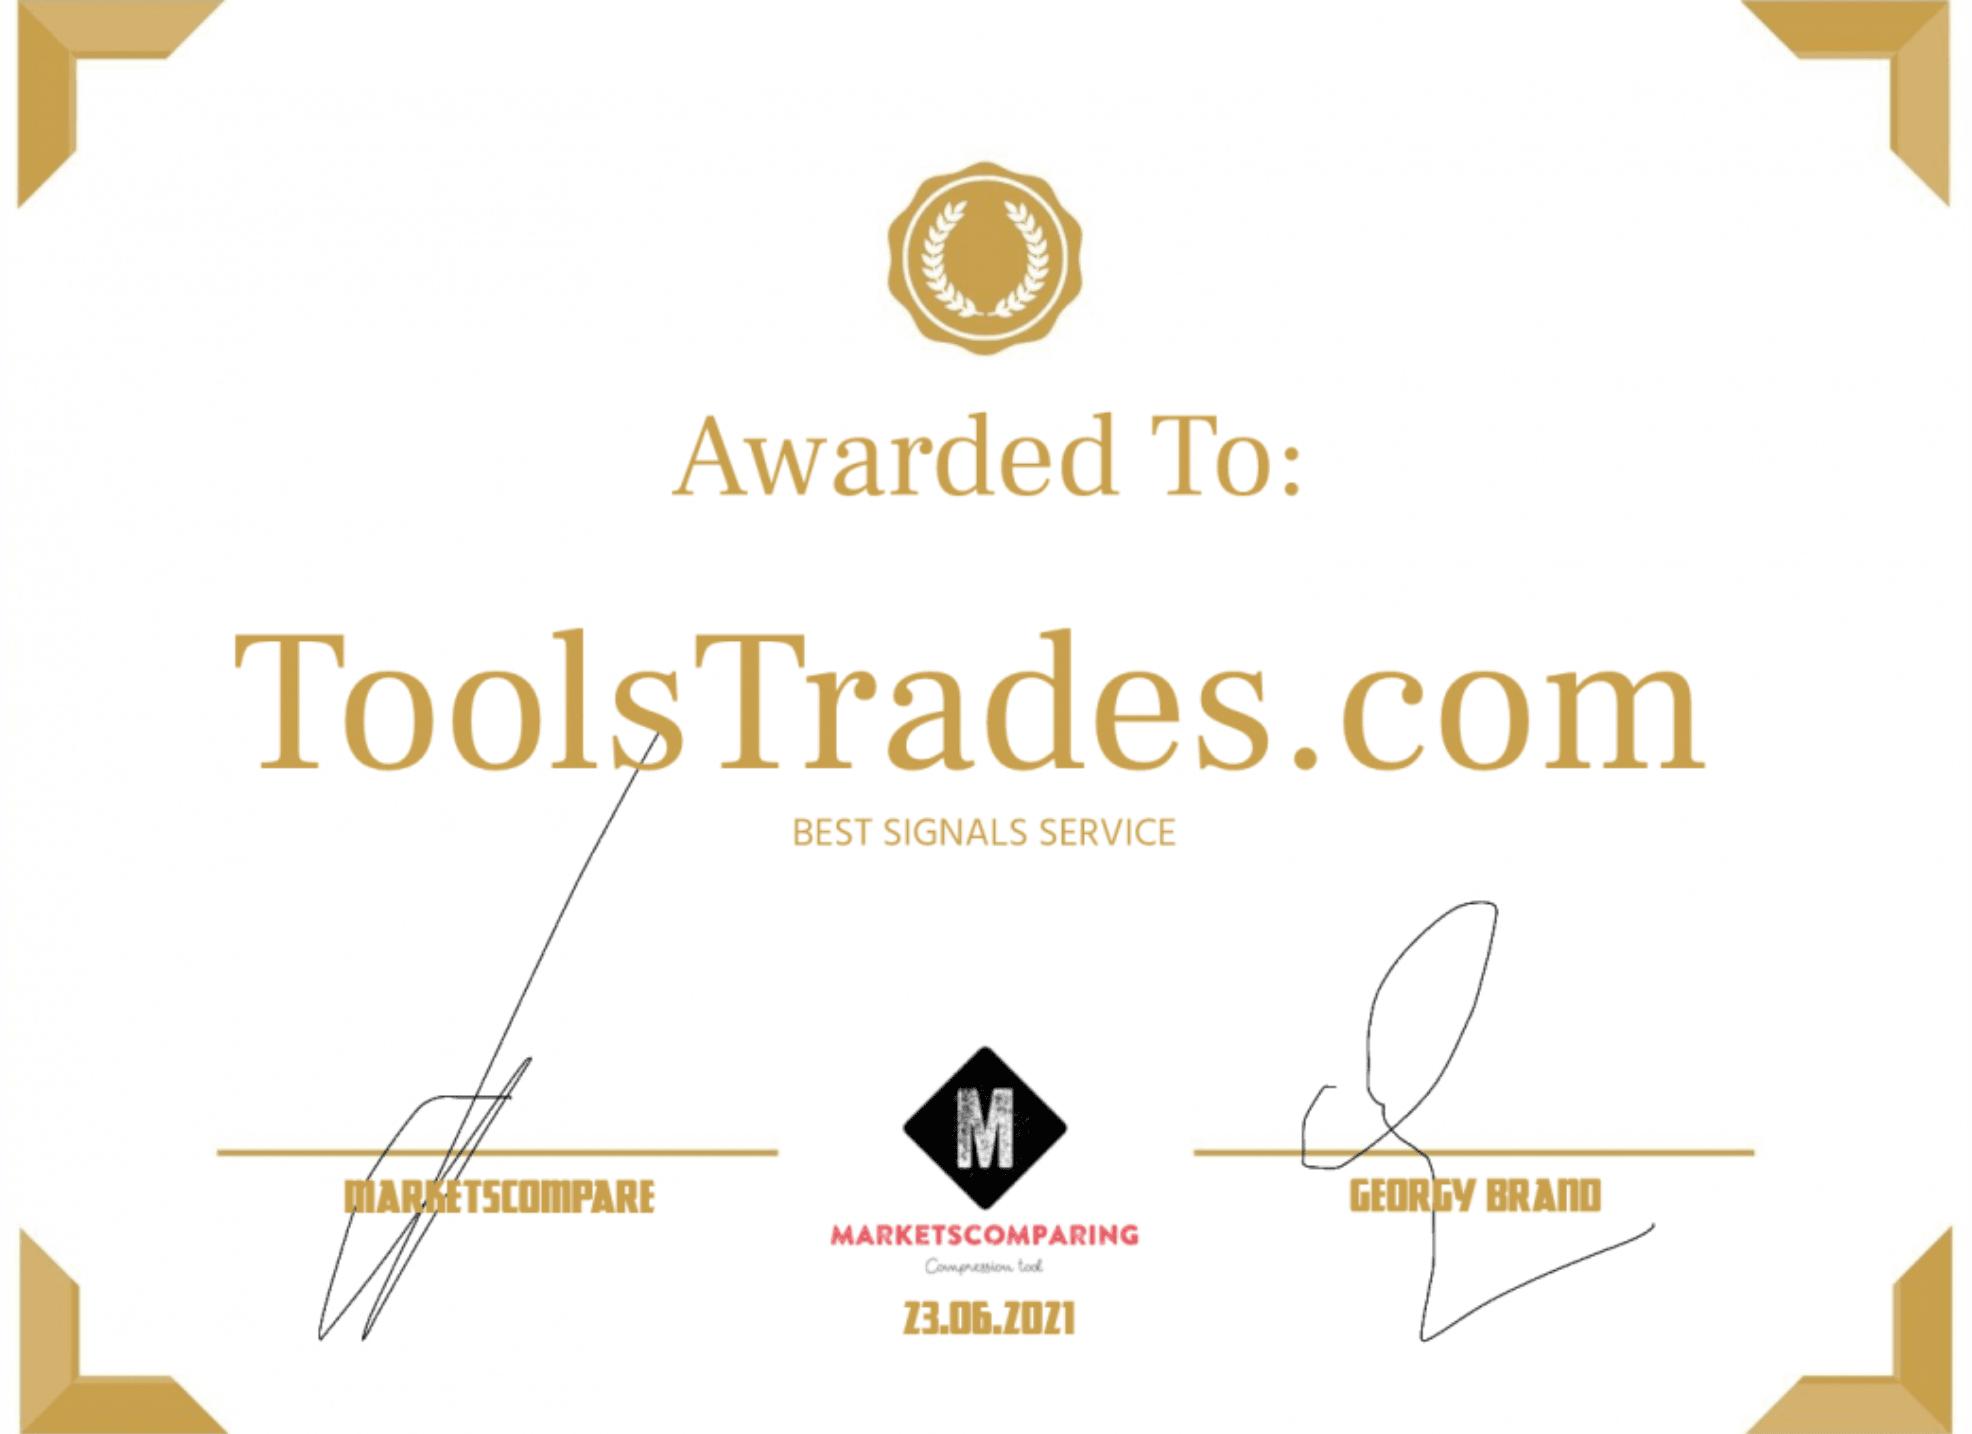 award02 Awards - ToolsTrades